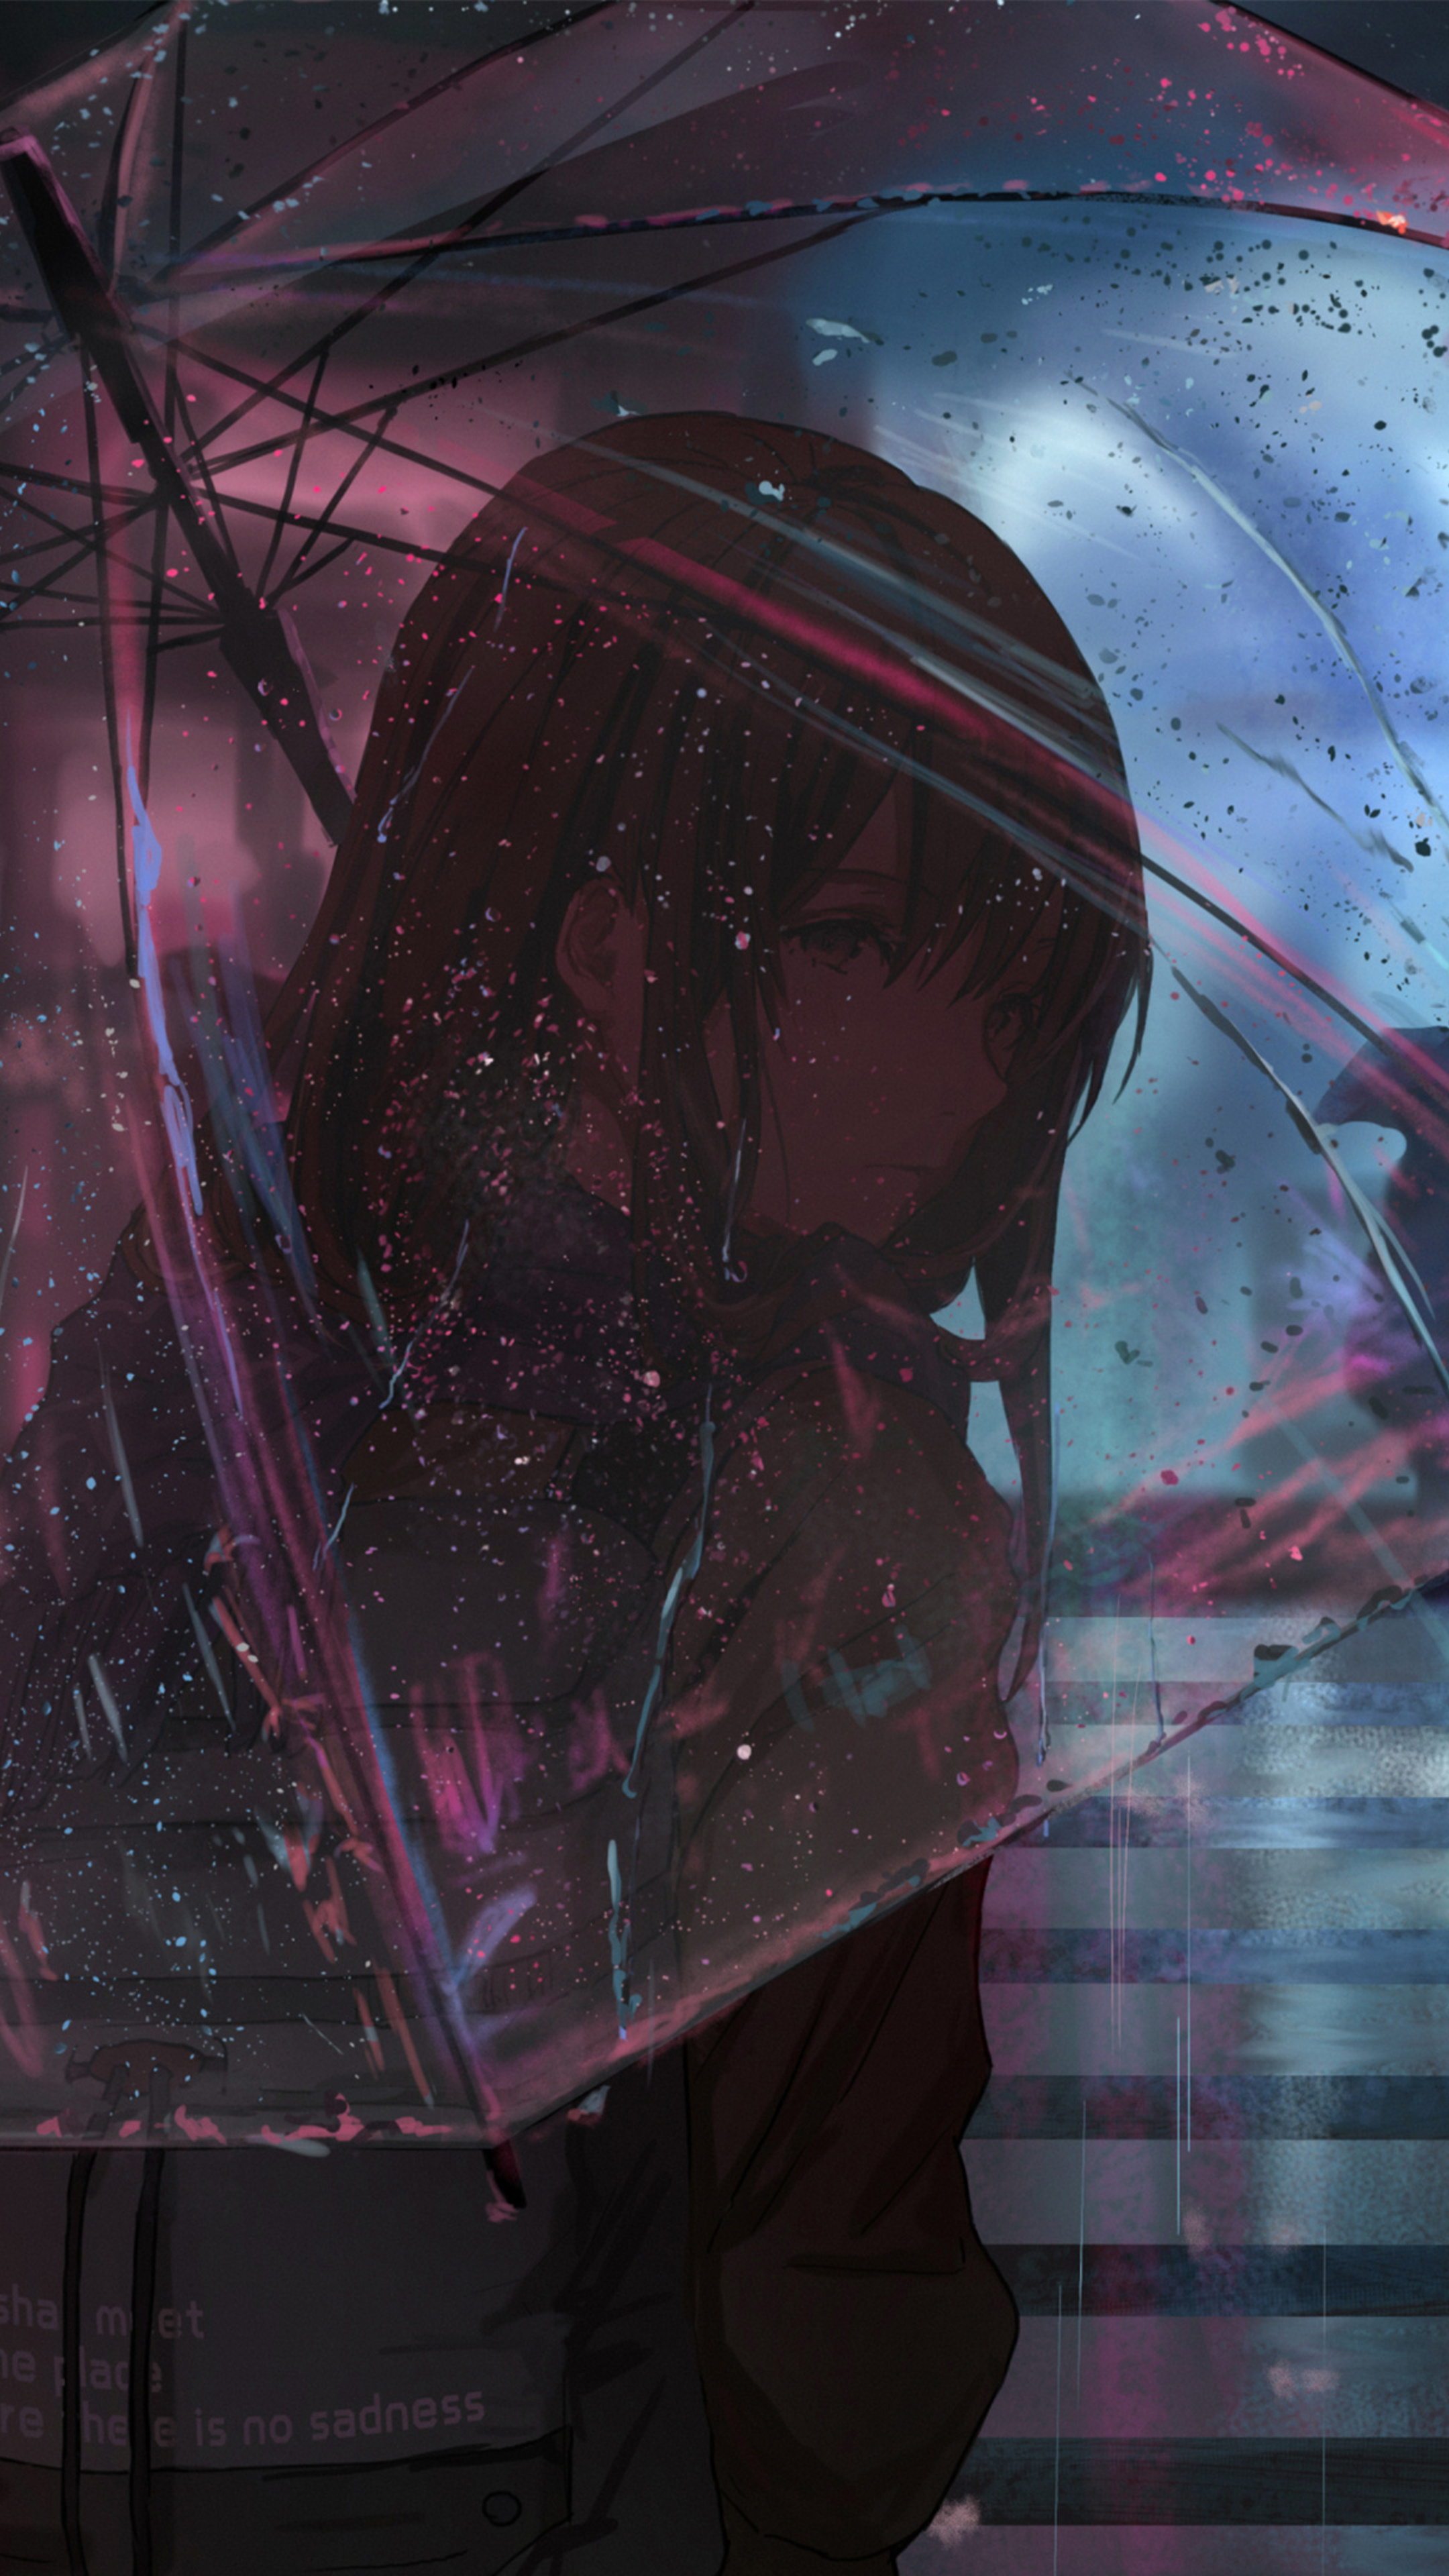 2160x3840 Anime Girl In Rain With Umbrella 4k Sony Xperia ...